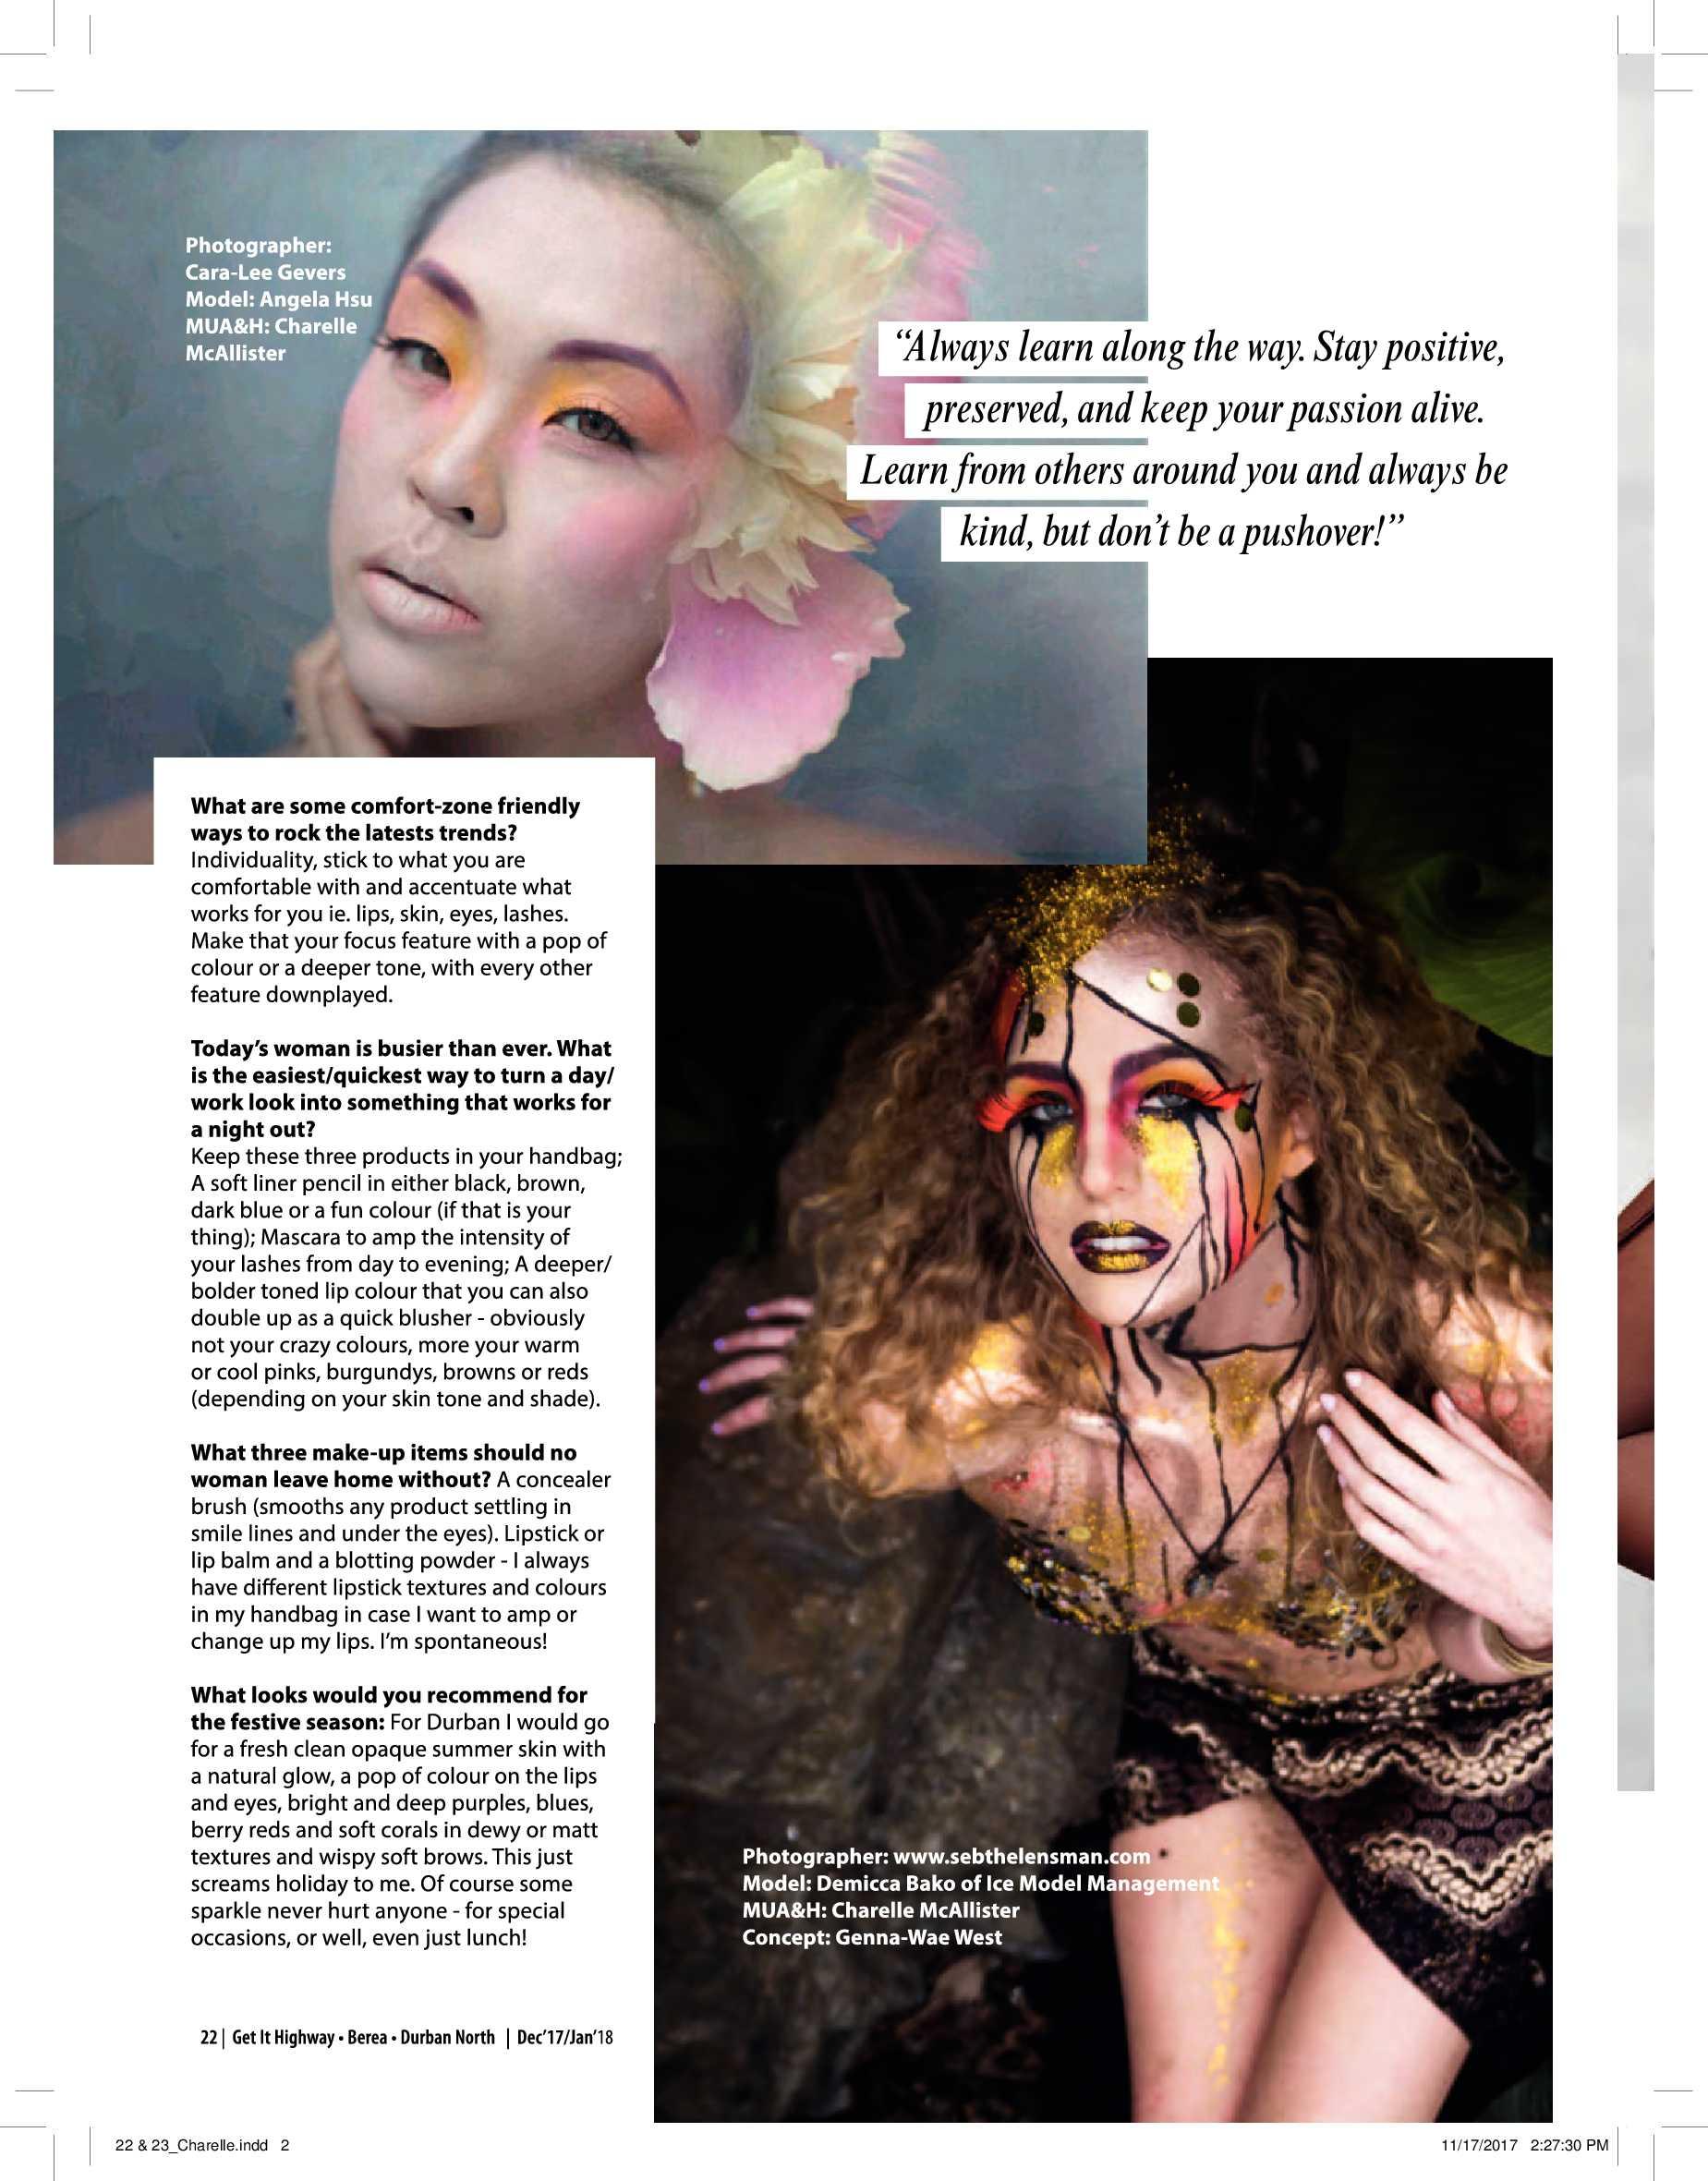 get-magazine-durban-december-2017-epapers-page-24